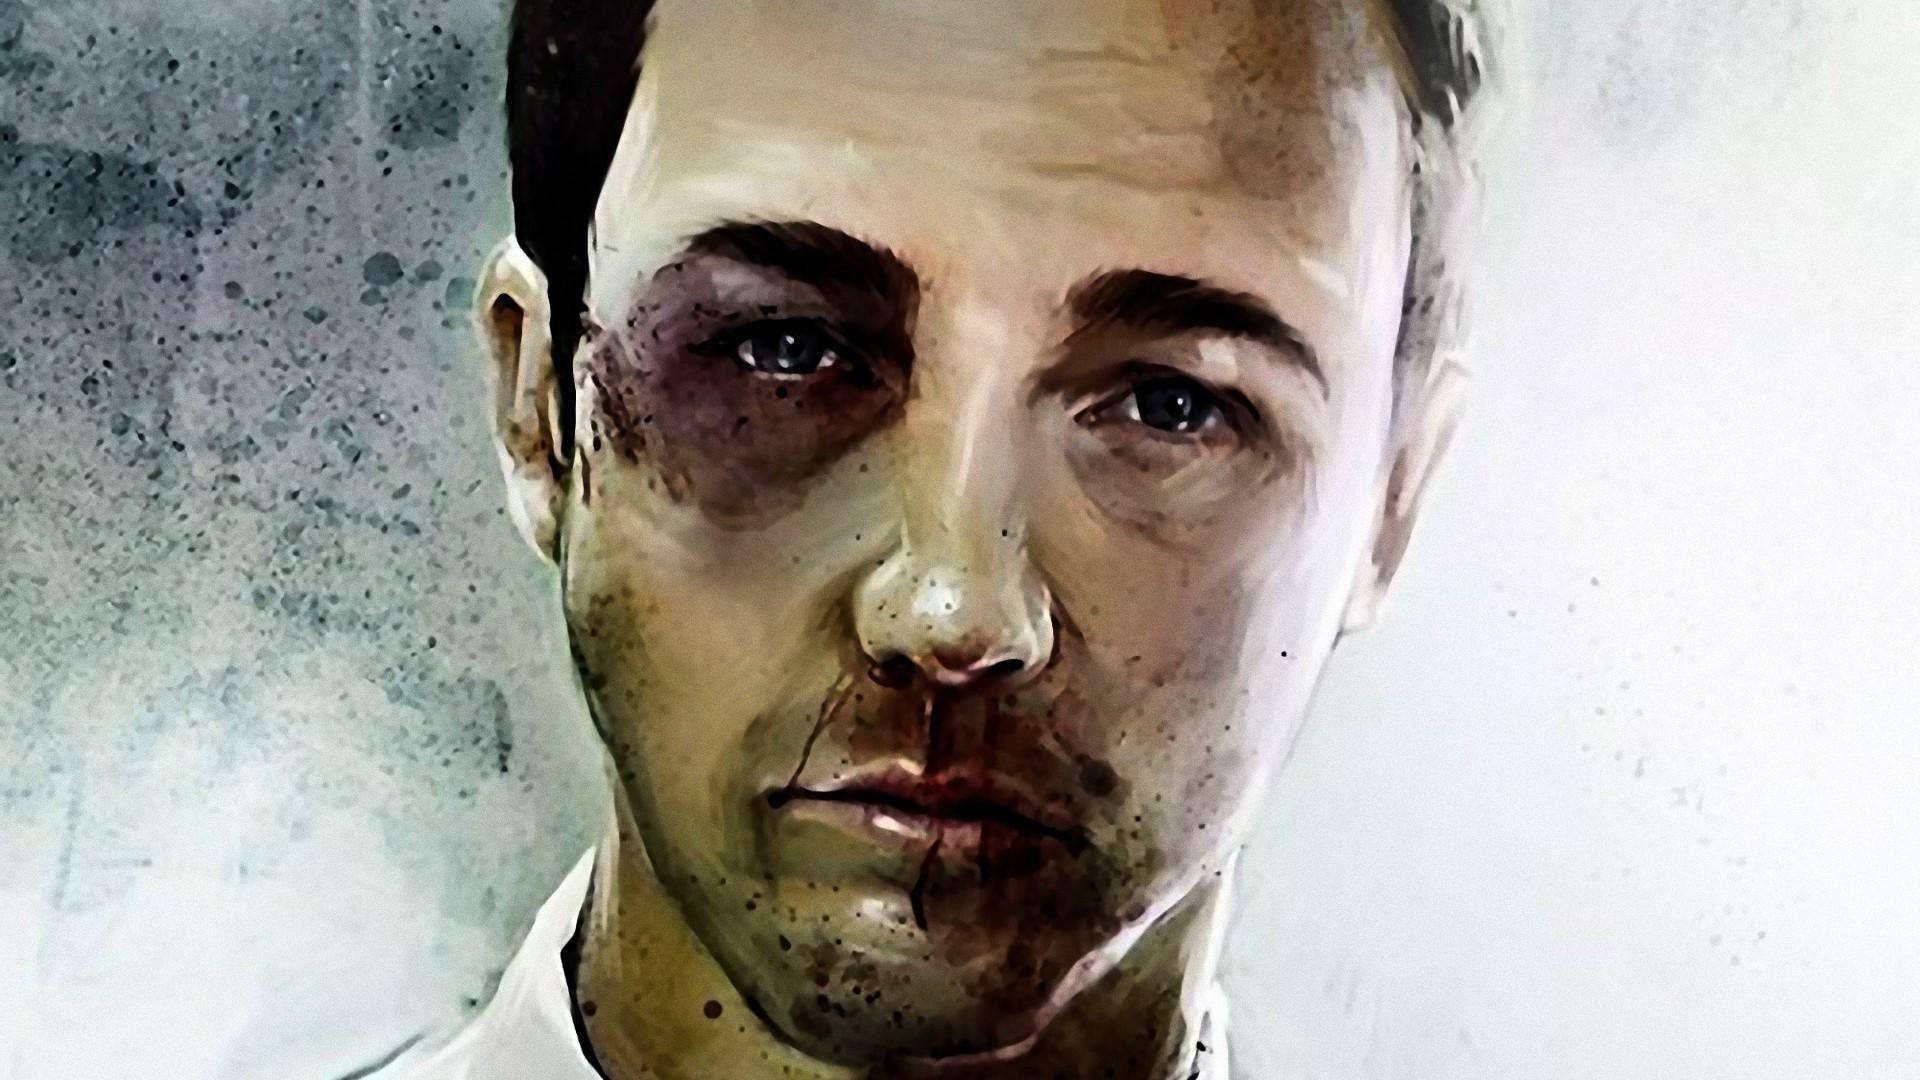 Wallpaper : face, portrait, movies, Fight Club, Edward ...